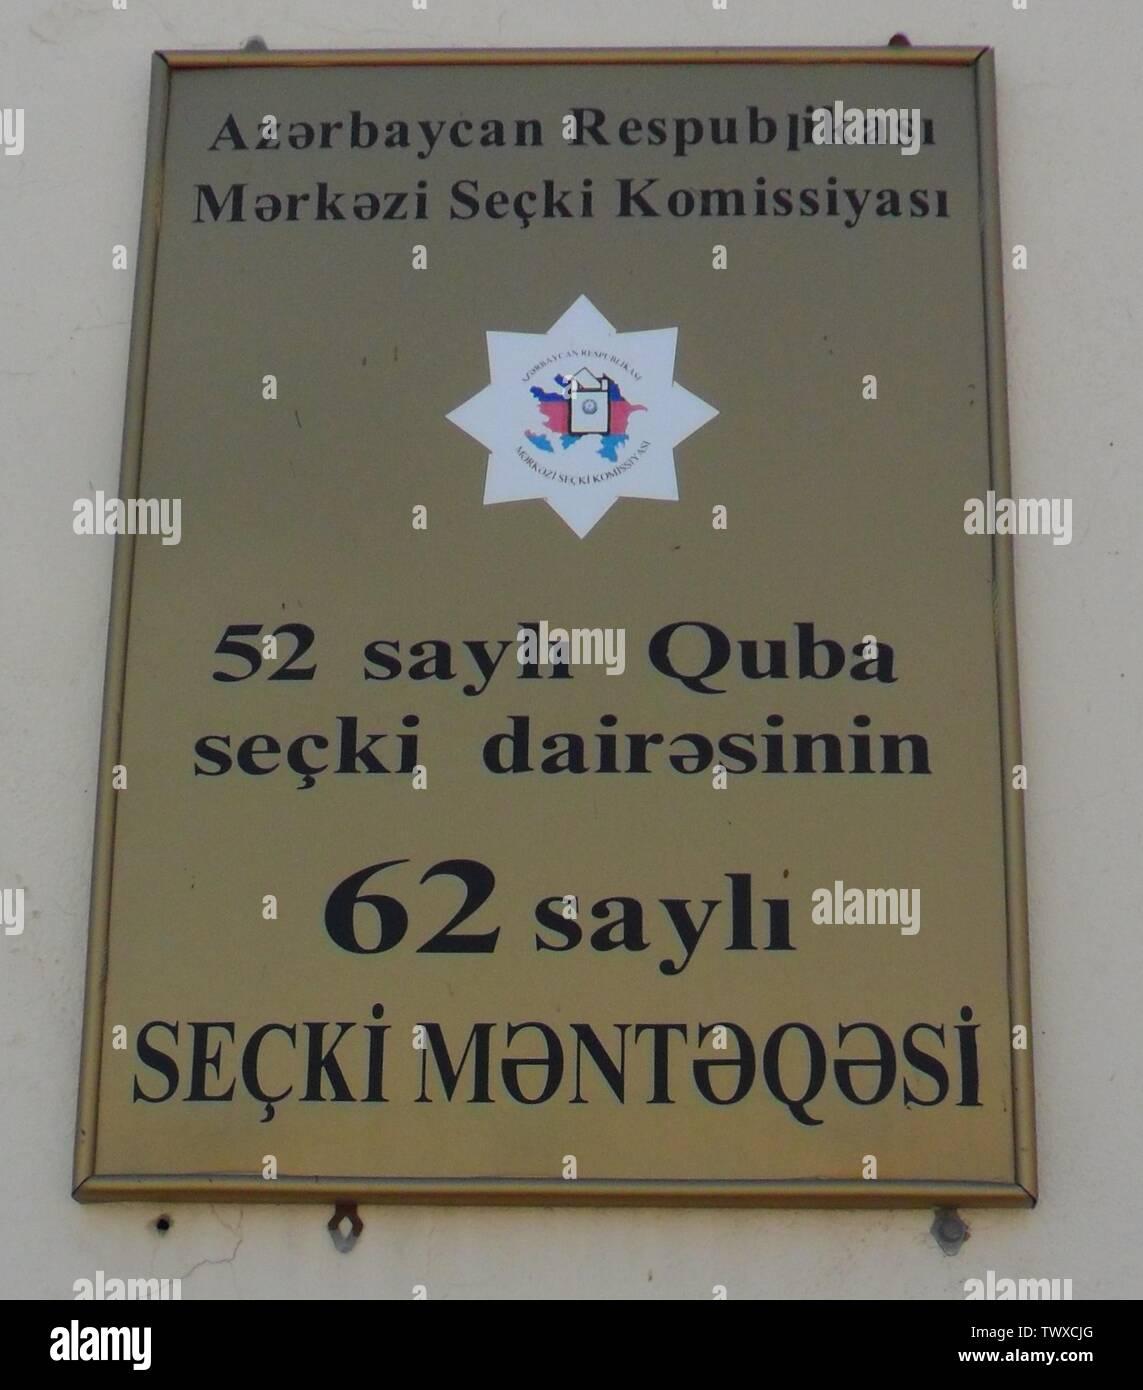 «Saylı Azərbaycanca: 52 seçki dairəsinin saylı Quba 62 seçki məntəqəsi Əlik (kəndi); 19 août 2012; travail; Tərxan Paşazadə (1982-) noms alternatifs Tarkhan Pashazade, Cekli829 Description photographe azerbaïdjanaise, Q12847312 et comité d'Etat pour travailler avec les organisations religieuses Date de naissance 29 novembre 1982 Lieu de naissance Lieu de travail Sumqayit Sumqayit Quba;;; Bakou Q12547942 contrôle d'autorité: Q59098230 QS créateur:P170,Q59098230; ' Photo Stock